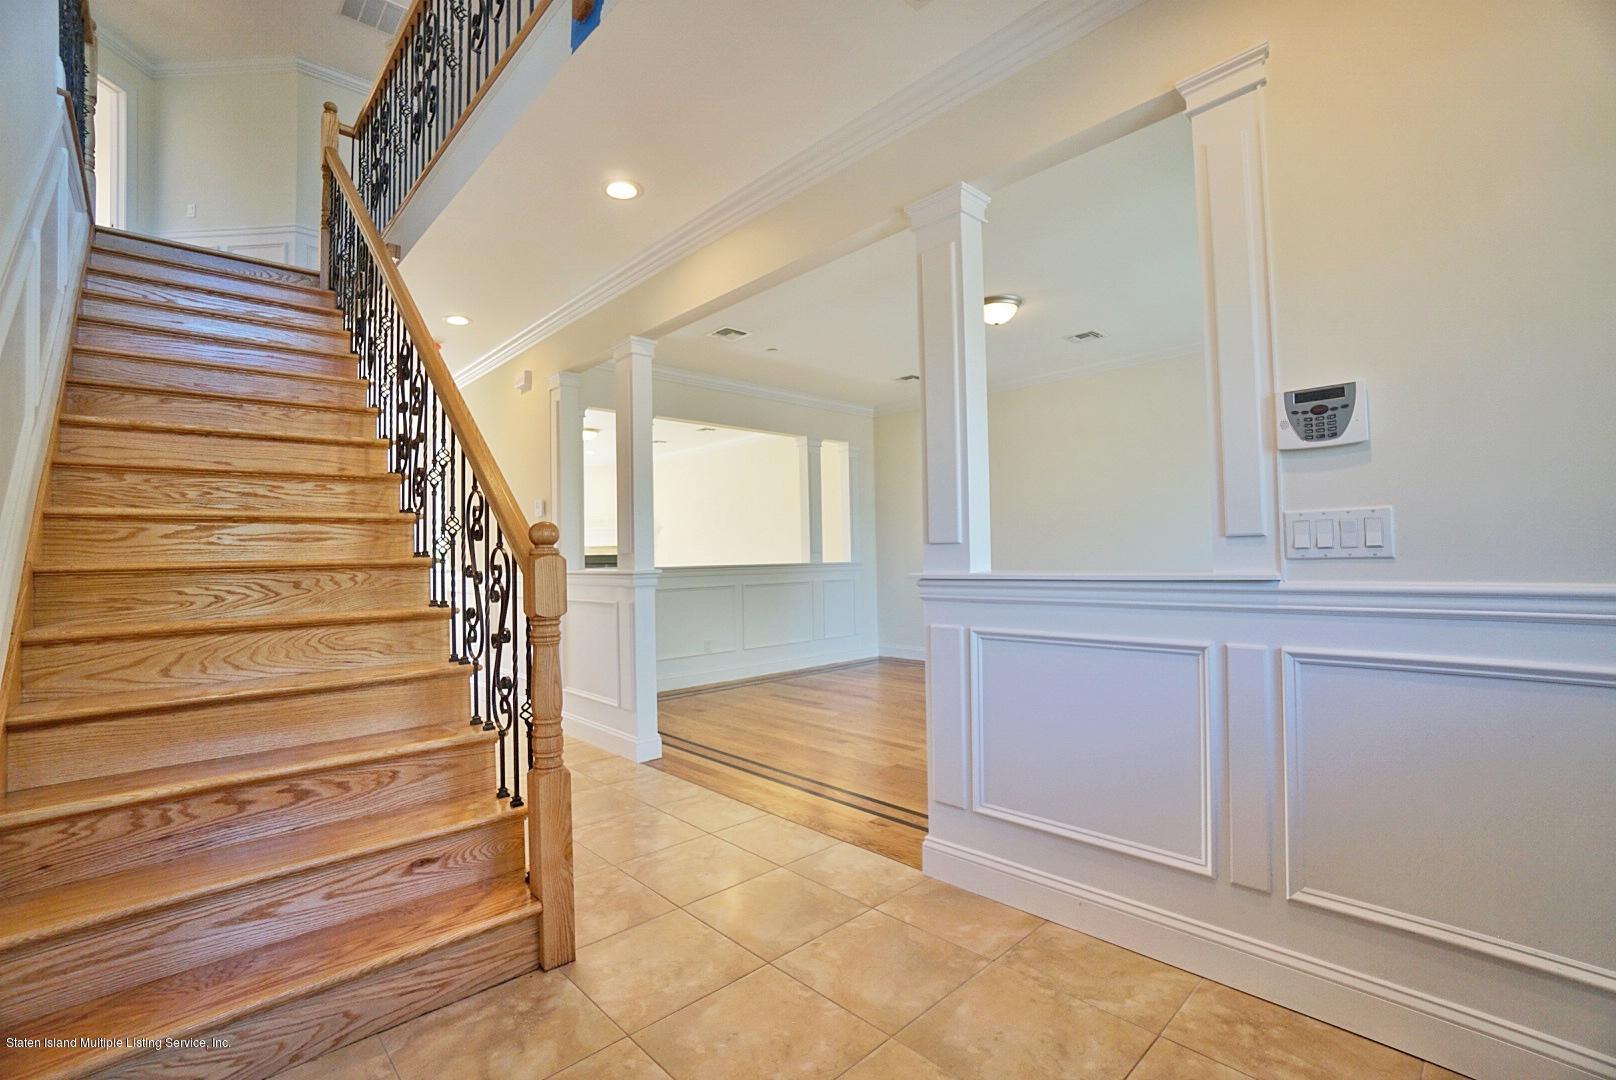 Single Family - Detached 678 Yetman Avenue  Staten Island, NY 10307, MLS-1132766-10